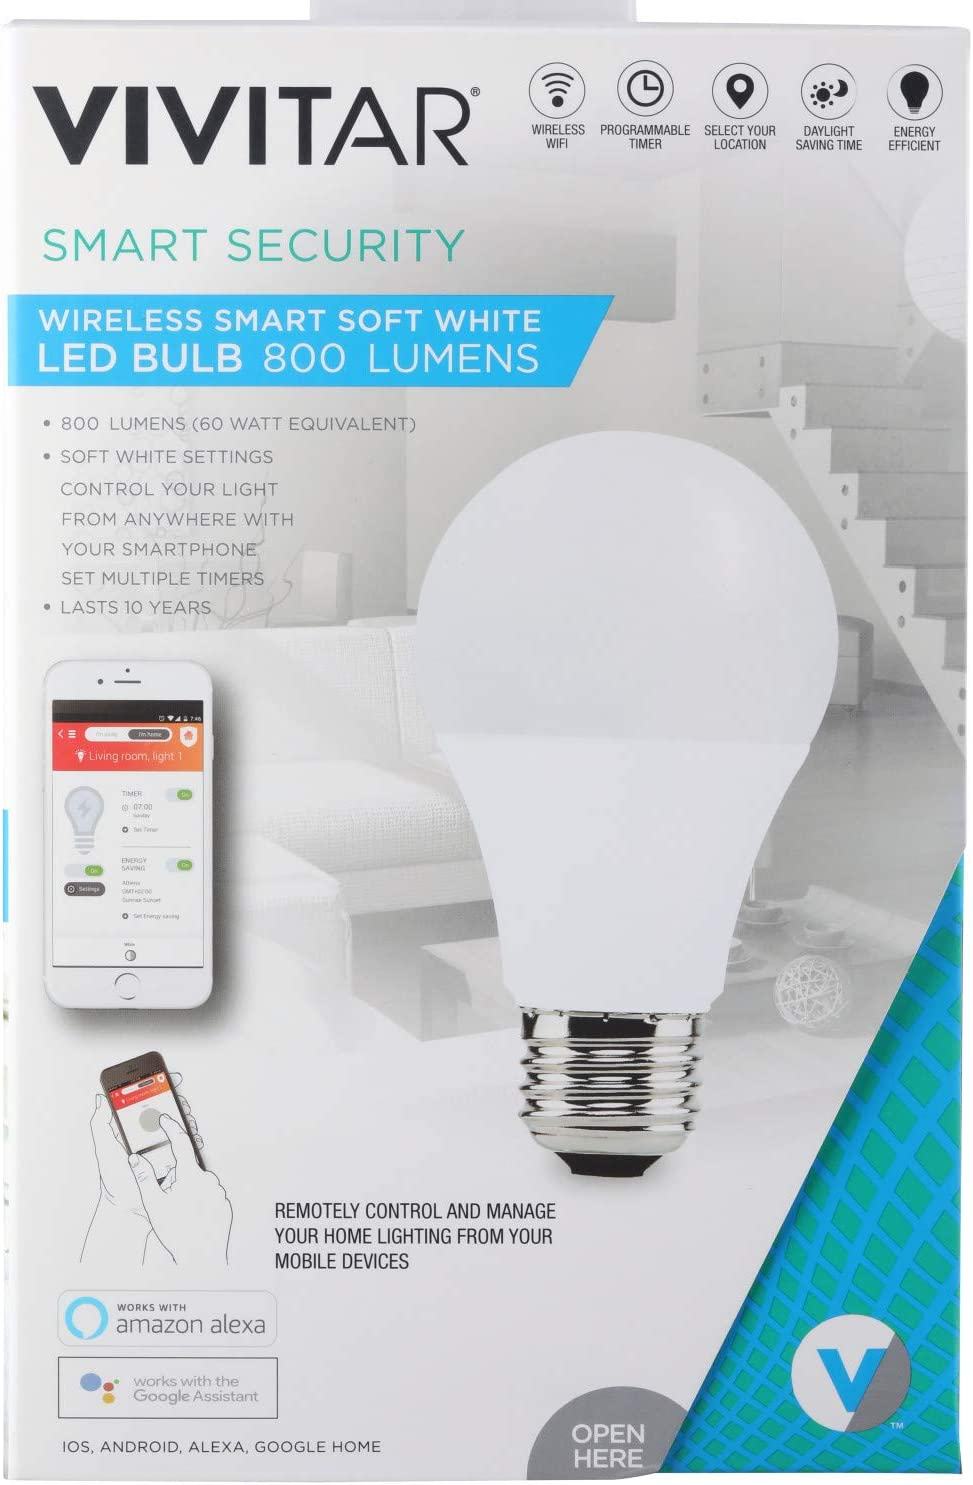 Vivitar LB-95 800 Lumen Soft White LED Bulb, Wireless Wi-Fi, Programmable Timer, Daylight Saving Time, 800 Lumens, Smart Soft White LED Bulb, Iftt/Nest Compatible, White